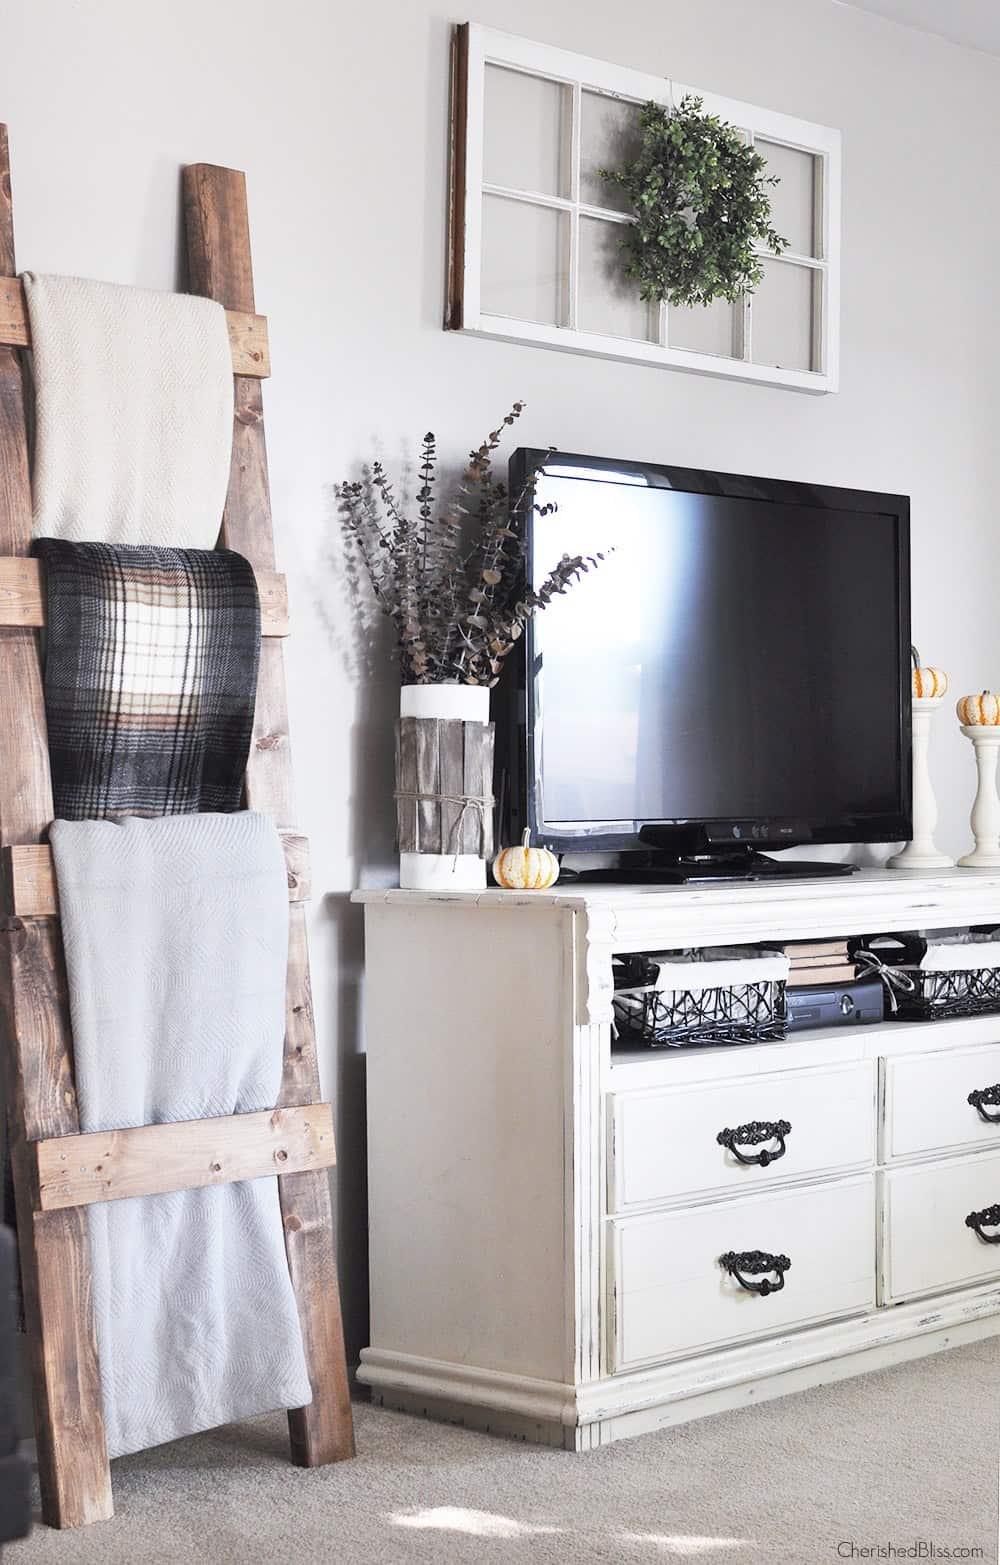 27 Rustic Farmhouse Living Room Decor Ideas For The Home